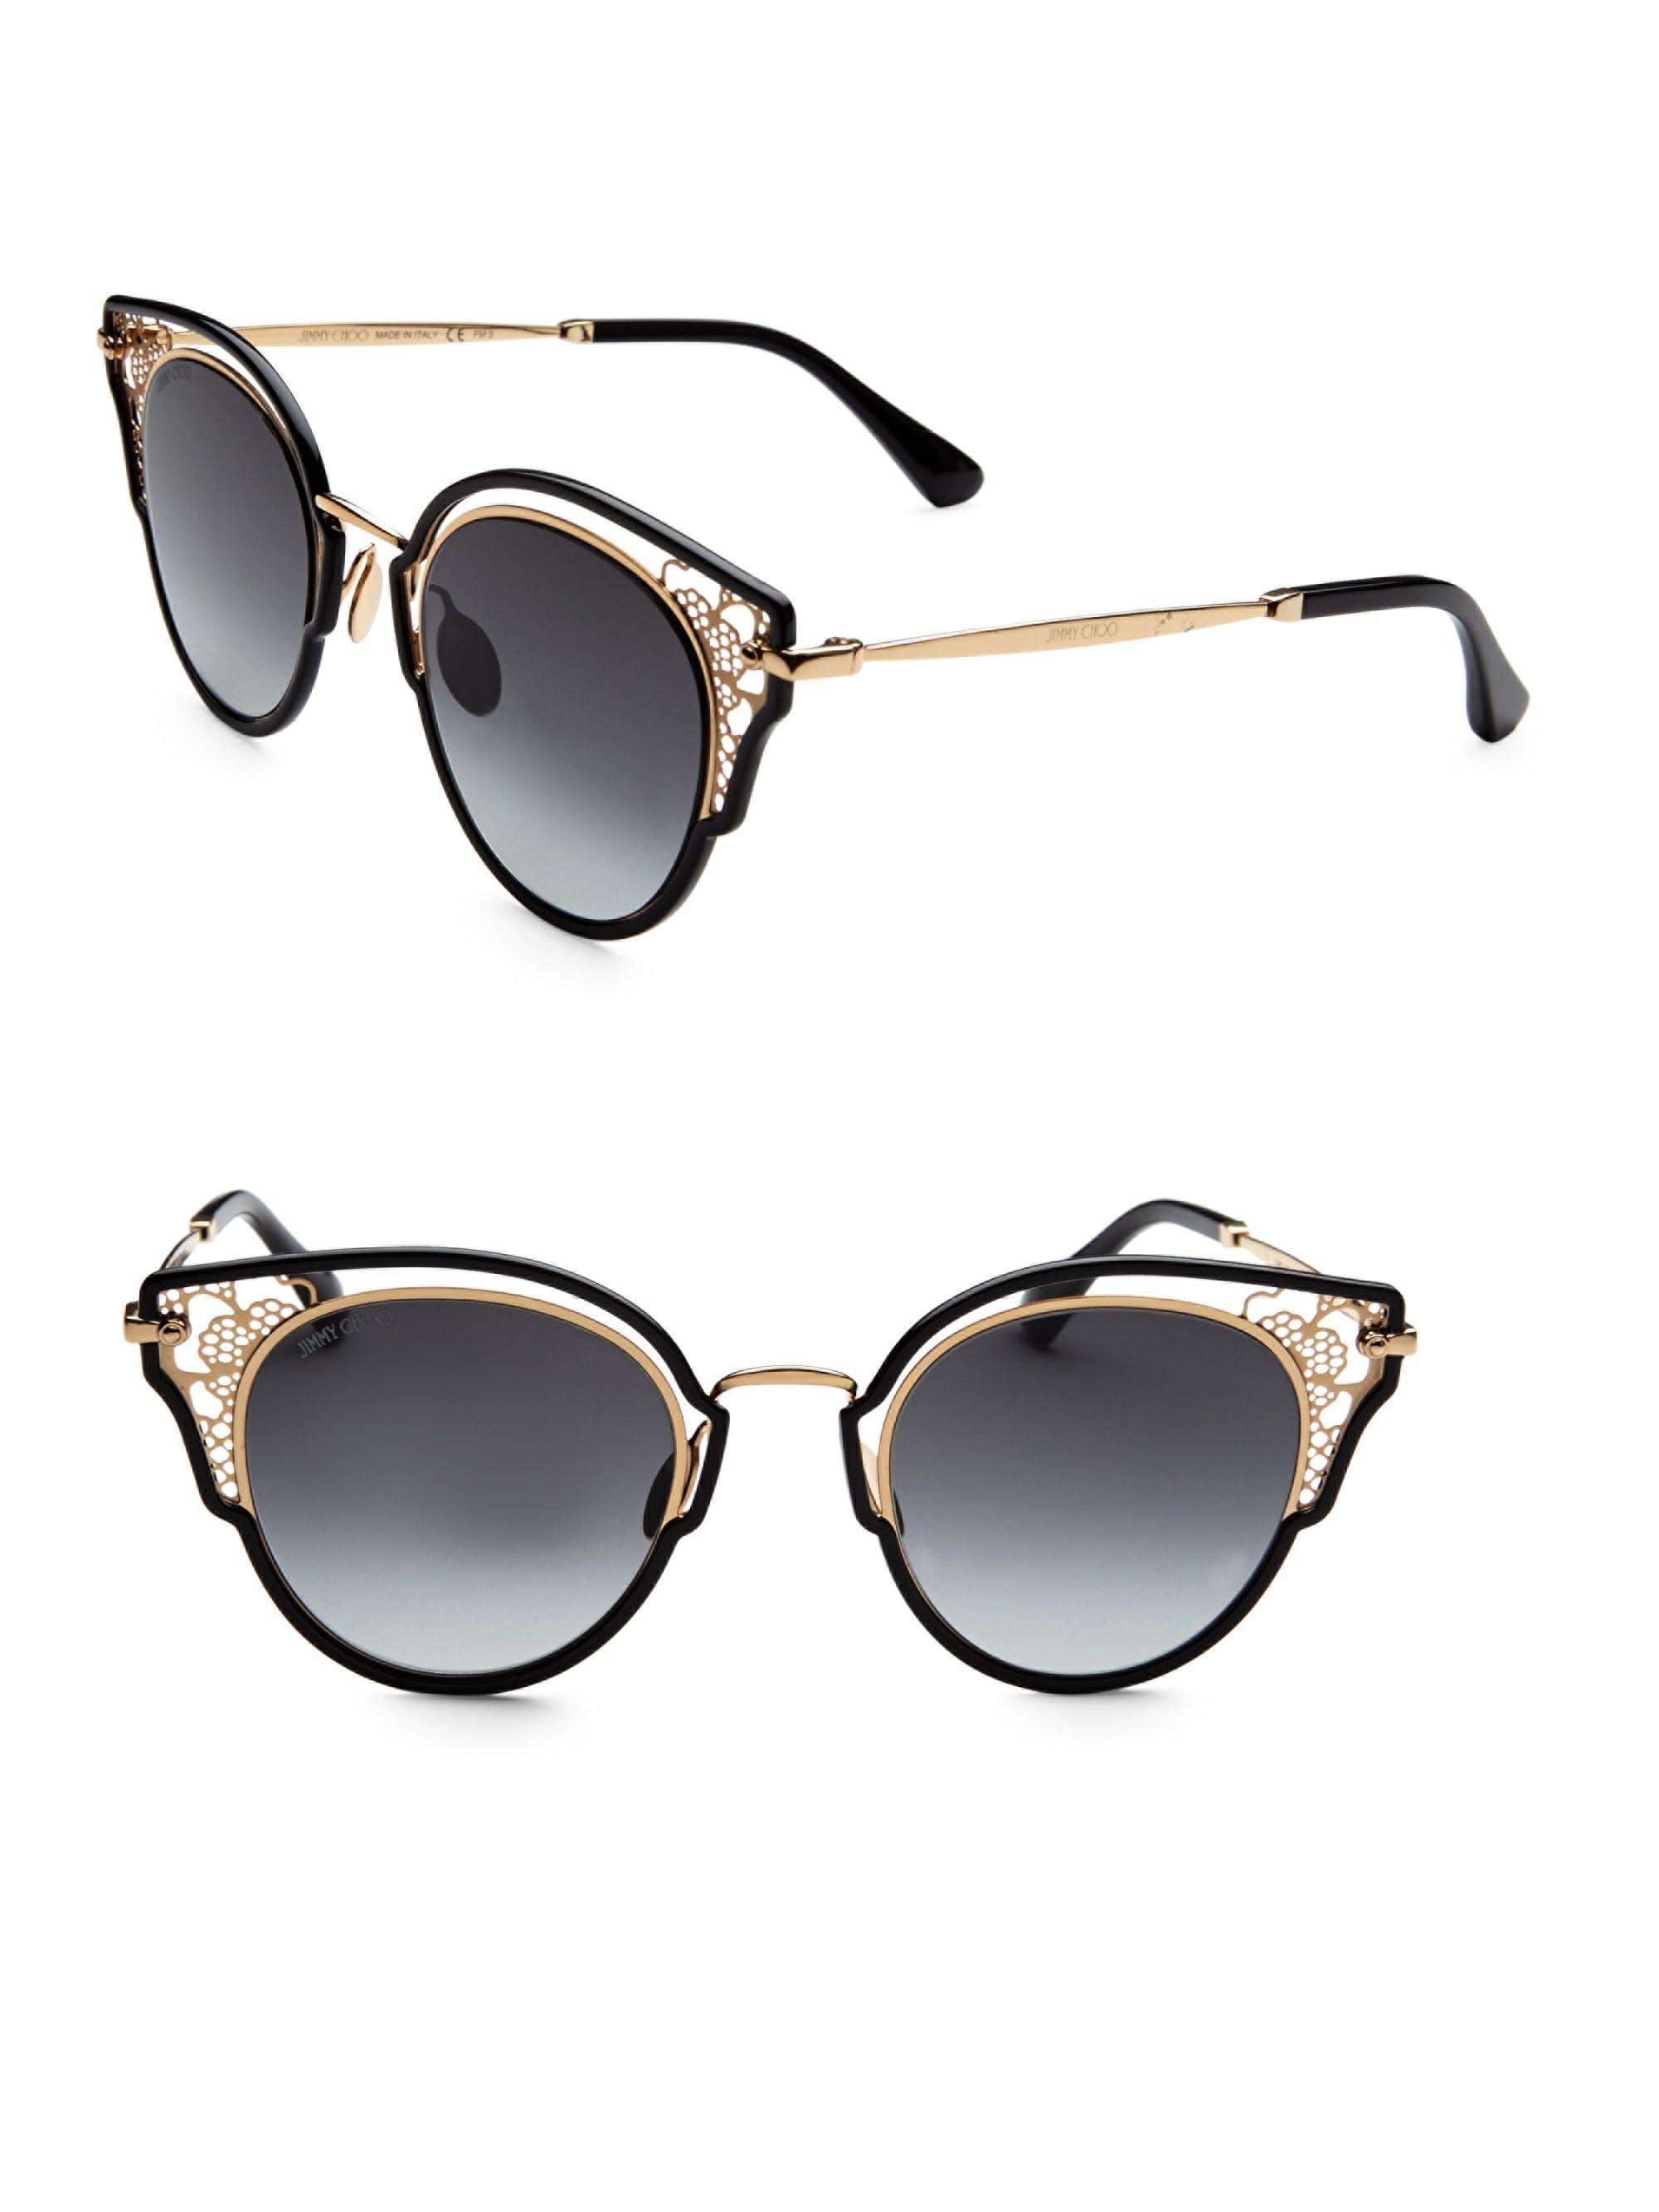 3143955fca Jimmy Choo Dhelia 48mm Panthos Sunglasses in Black - Lyst